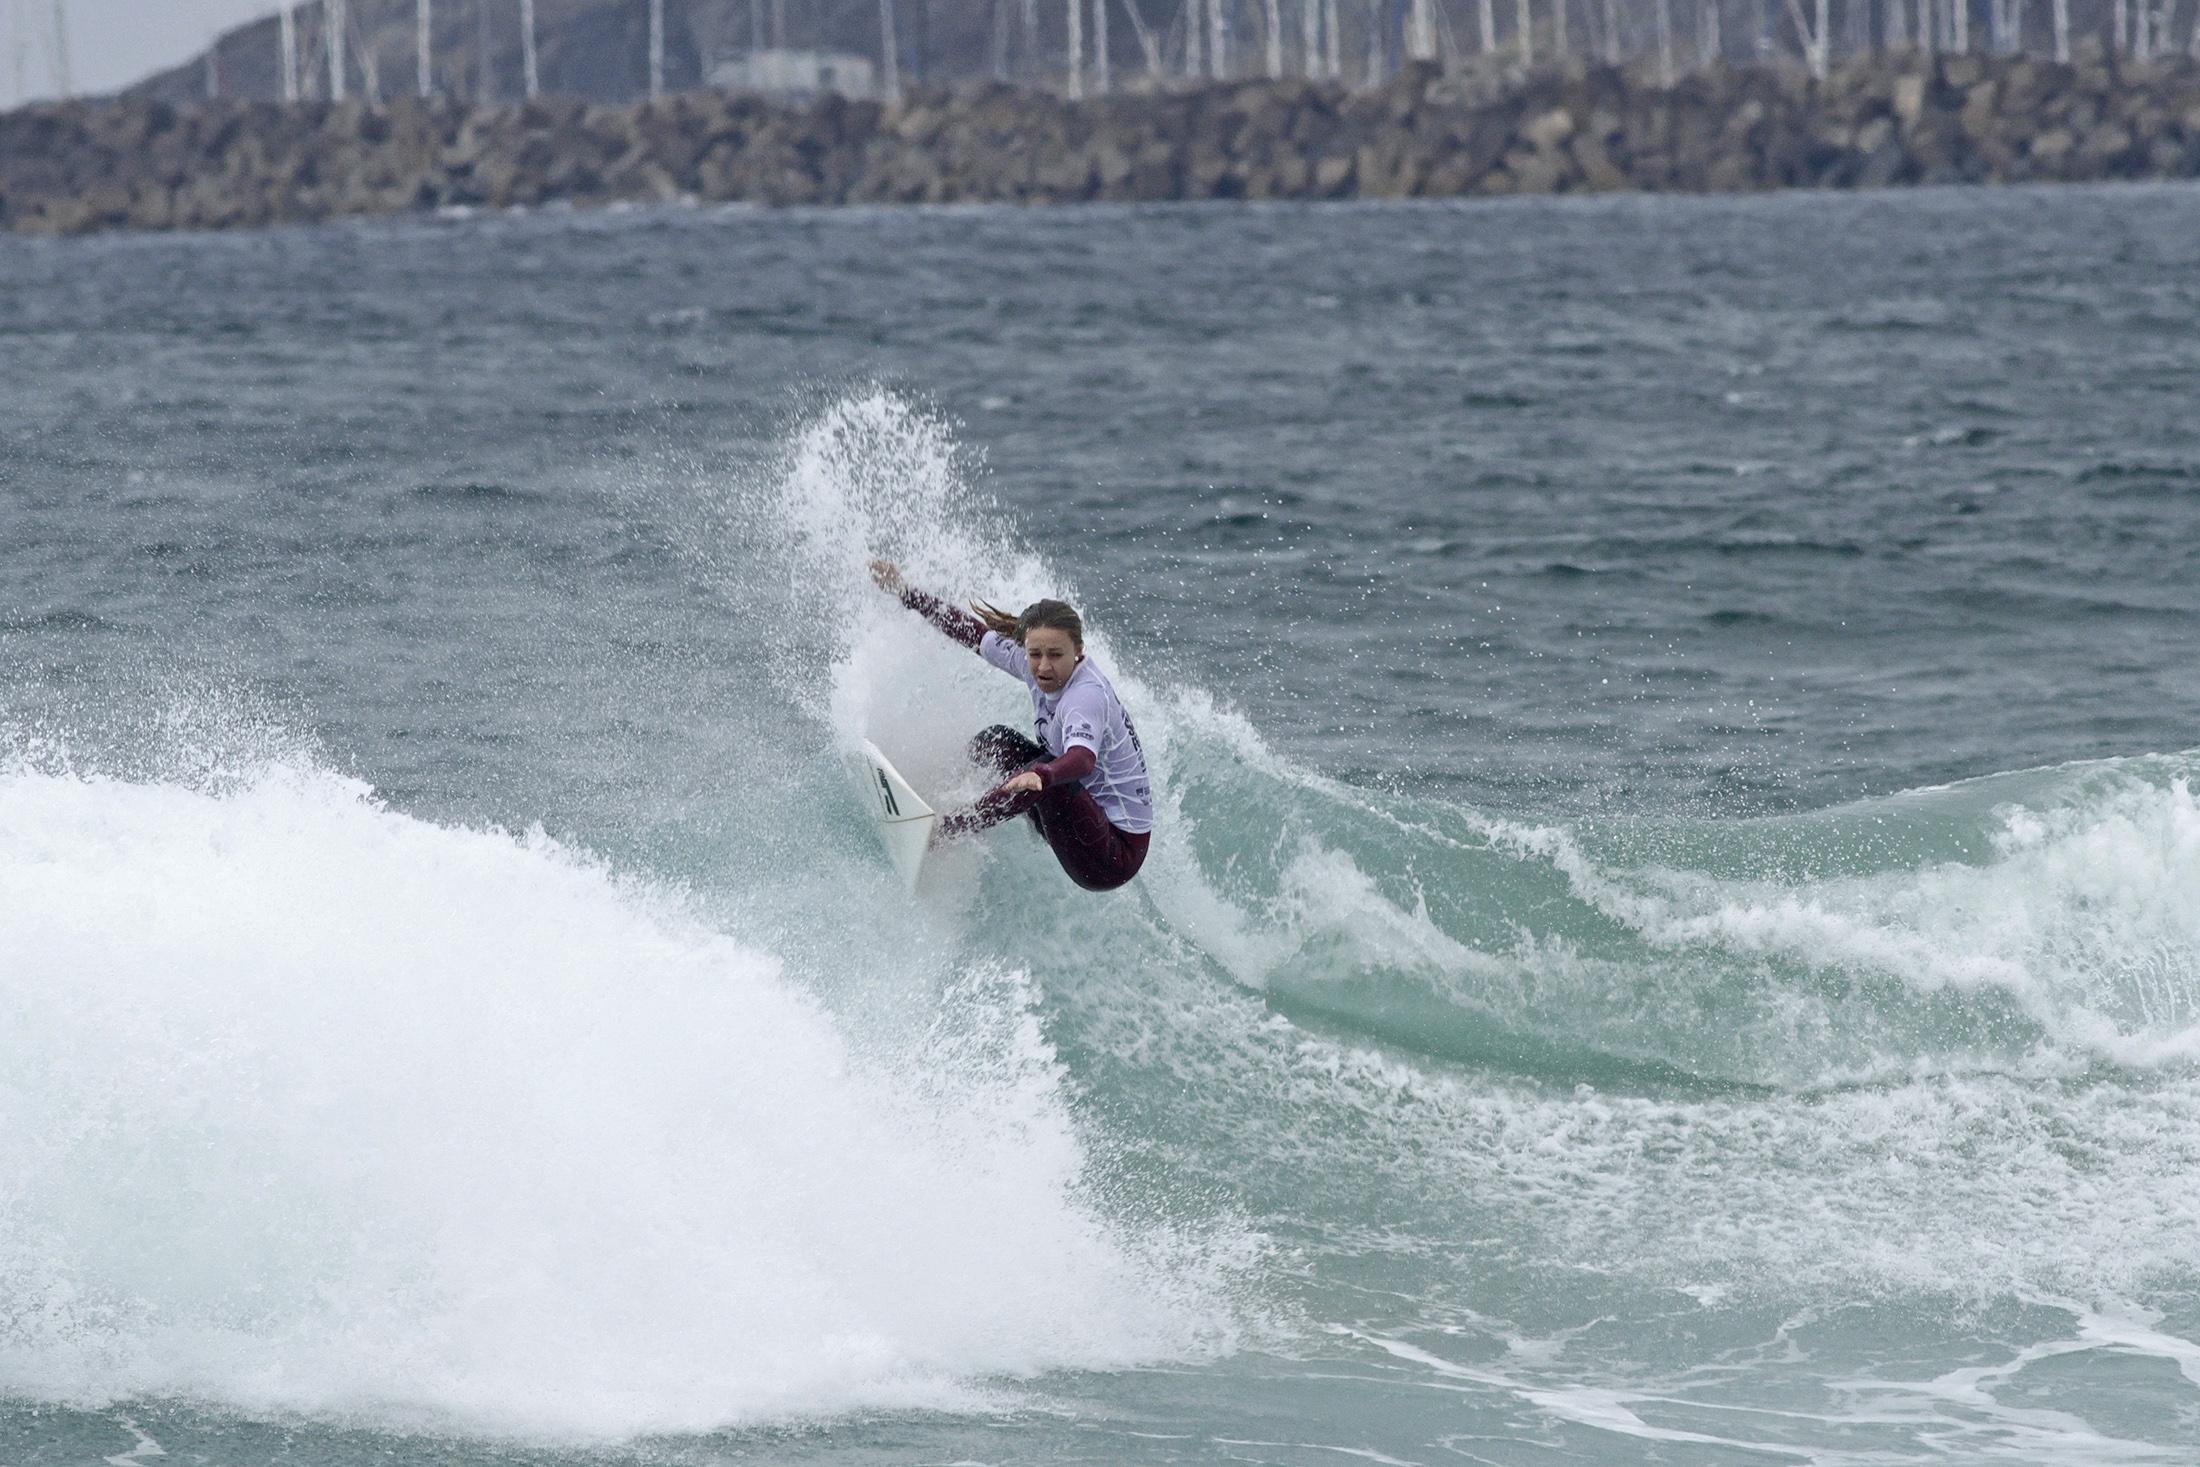 Jess Grimwood Photo: Surfing Australia/Smith